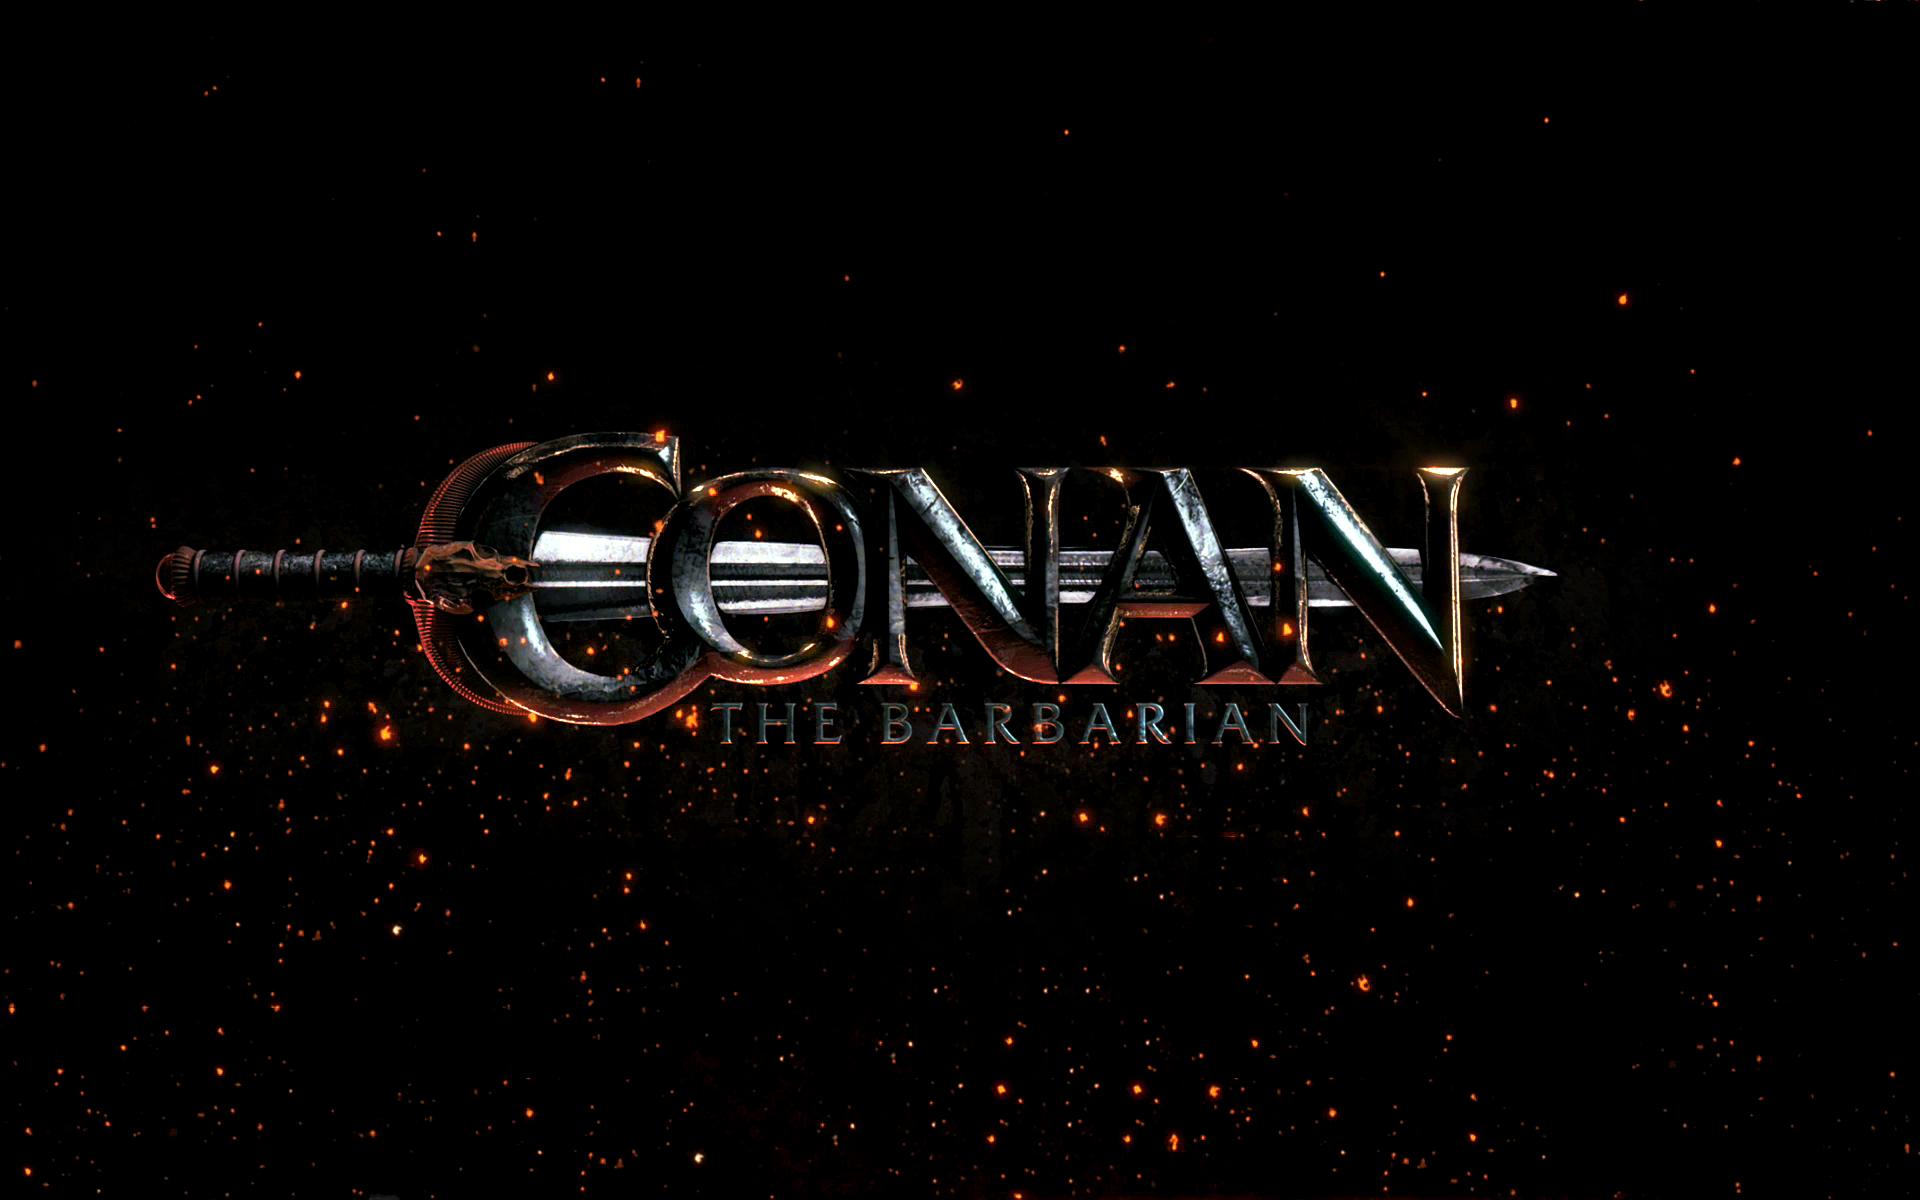 Conan The Barbarian wallpaper   435079 1920x1200